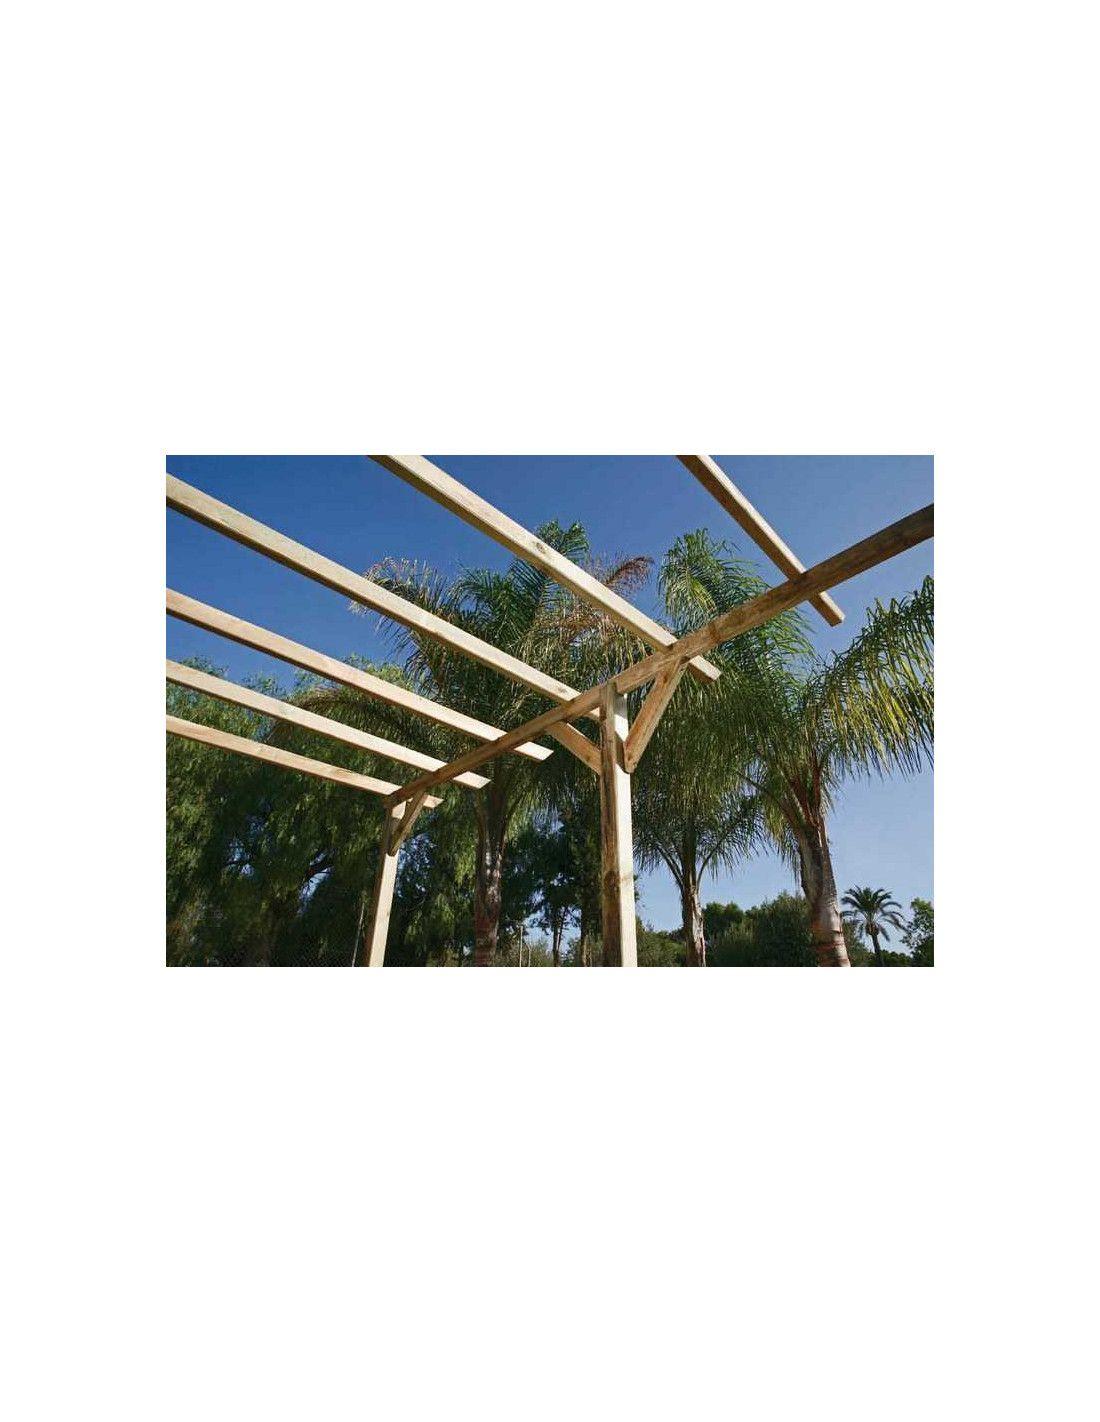 P rgola de madera 7 5 m - Accesorios para pergolas ...